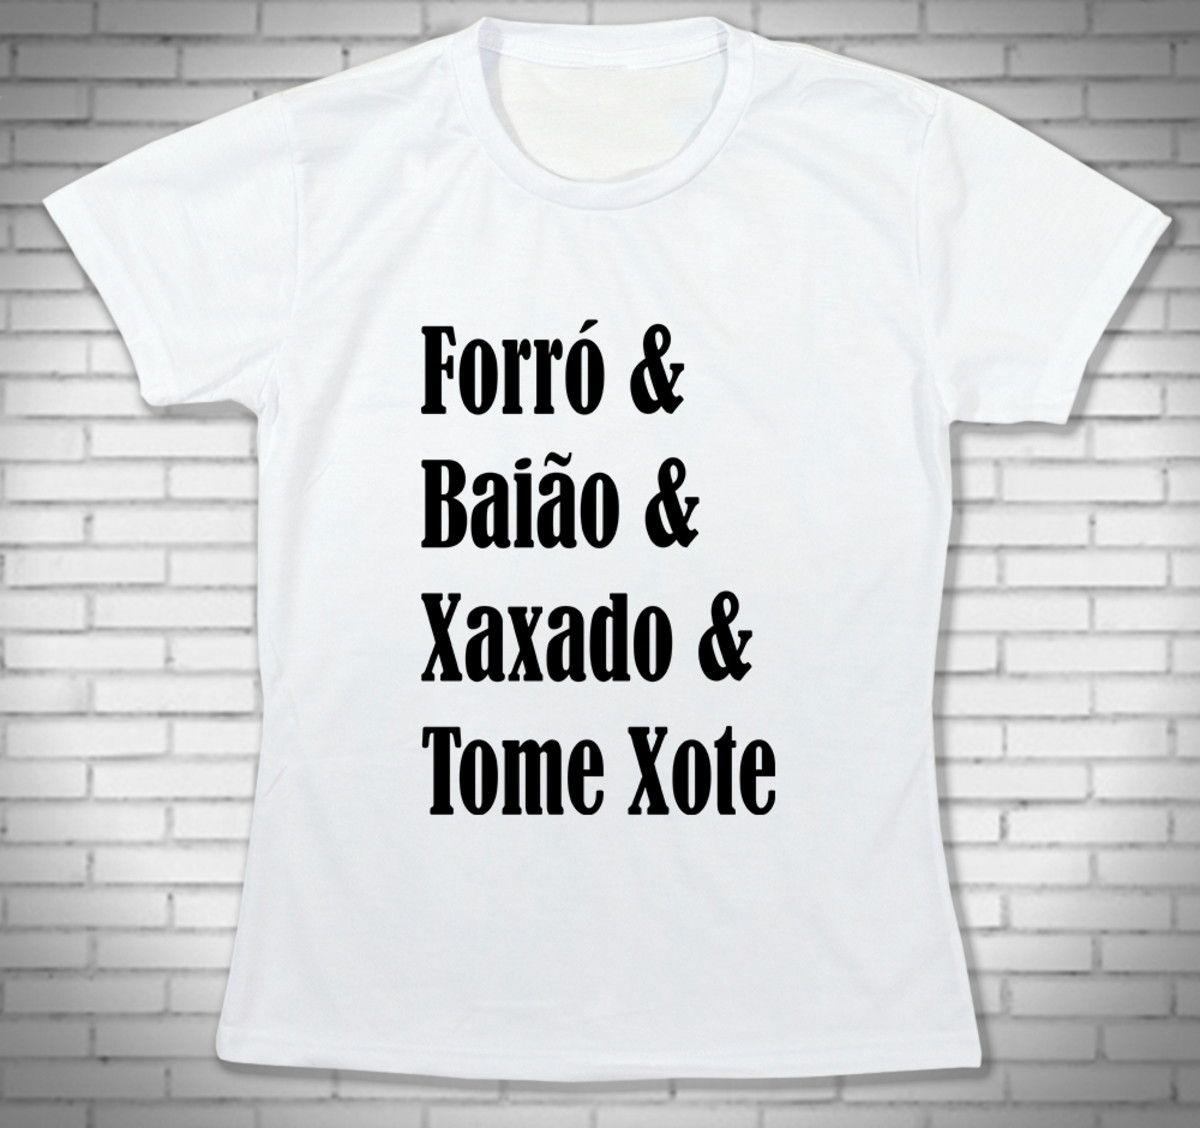 785dc71592 Camiseta Forró Baião Xaxado e Xote - Babylook Bca no Elo7